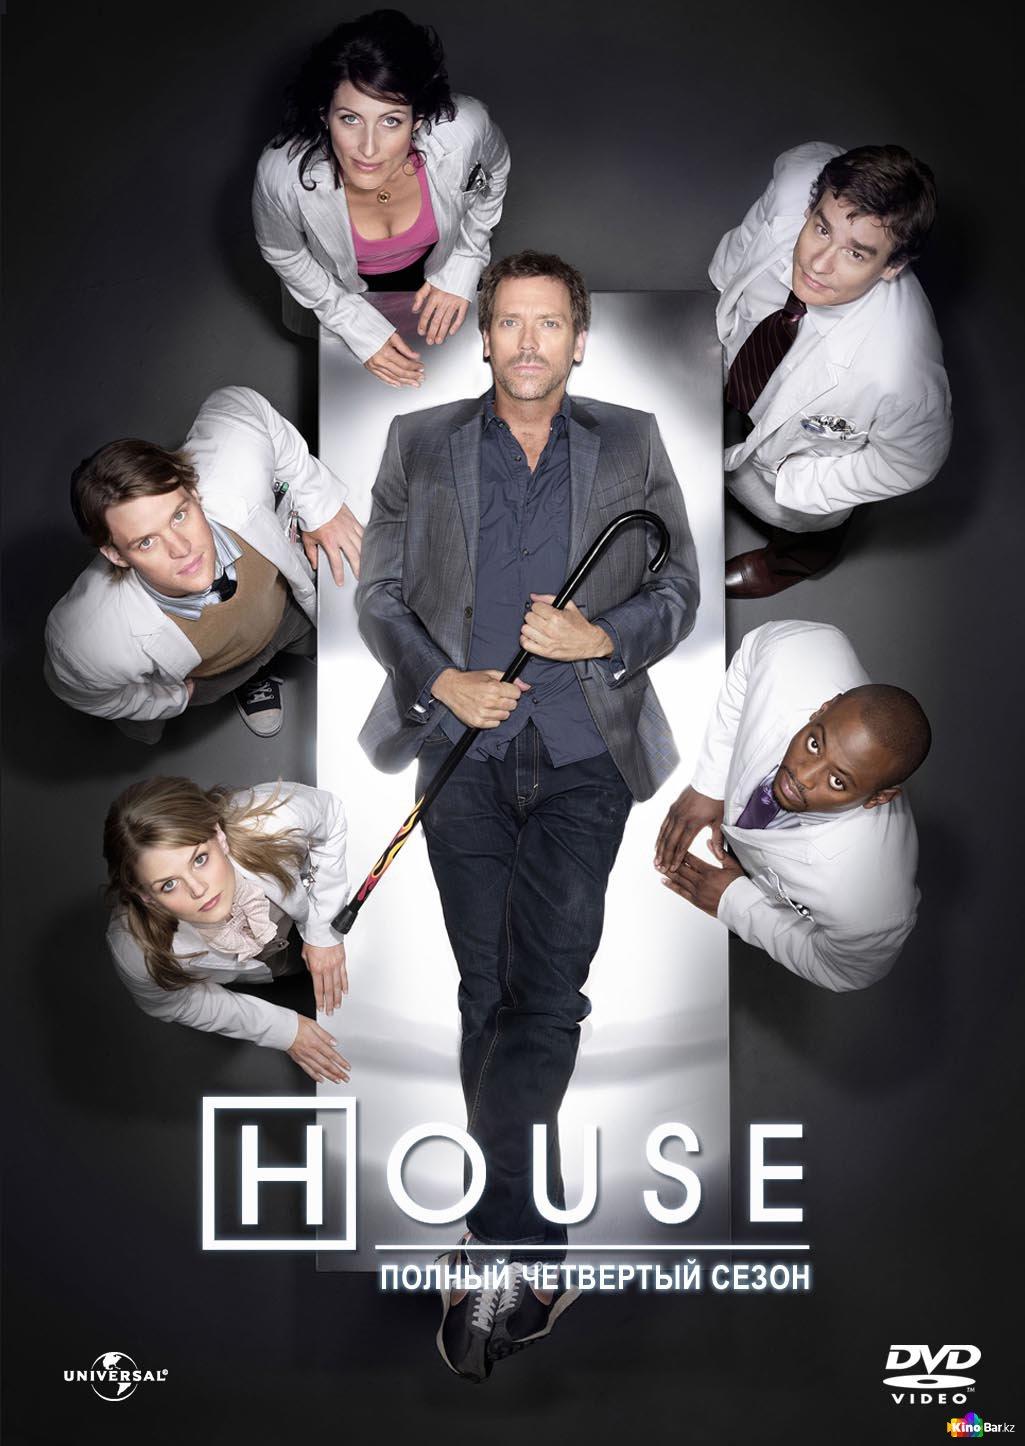 Фильм Доктор Хаус 4 сезон смотреть онлайн